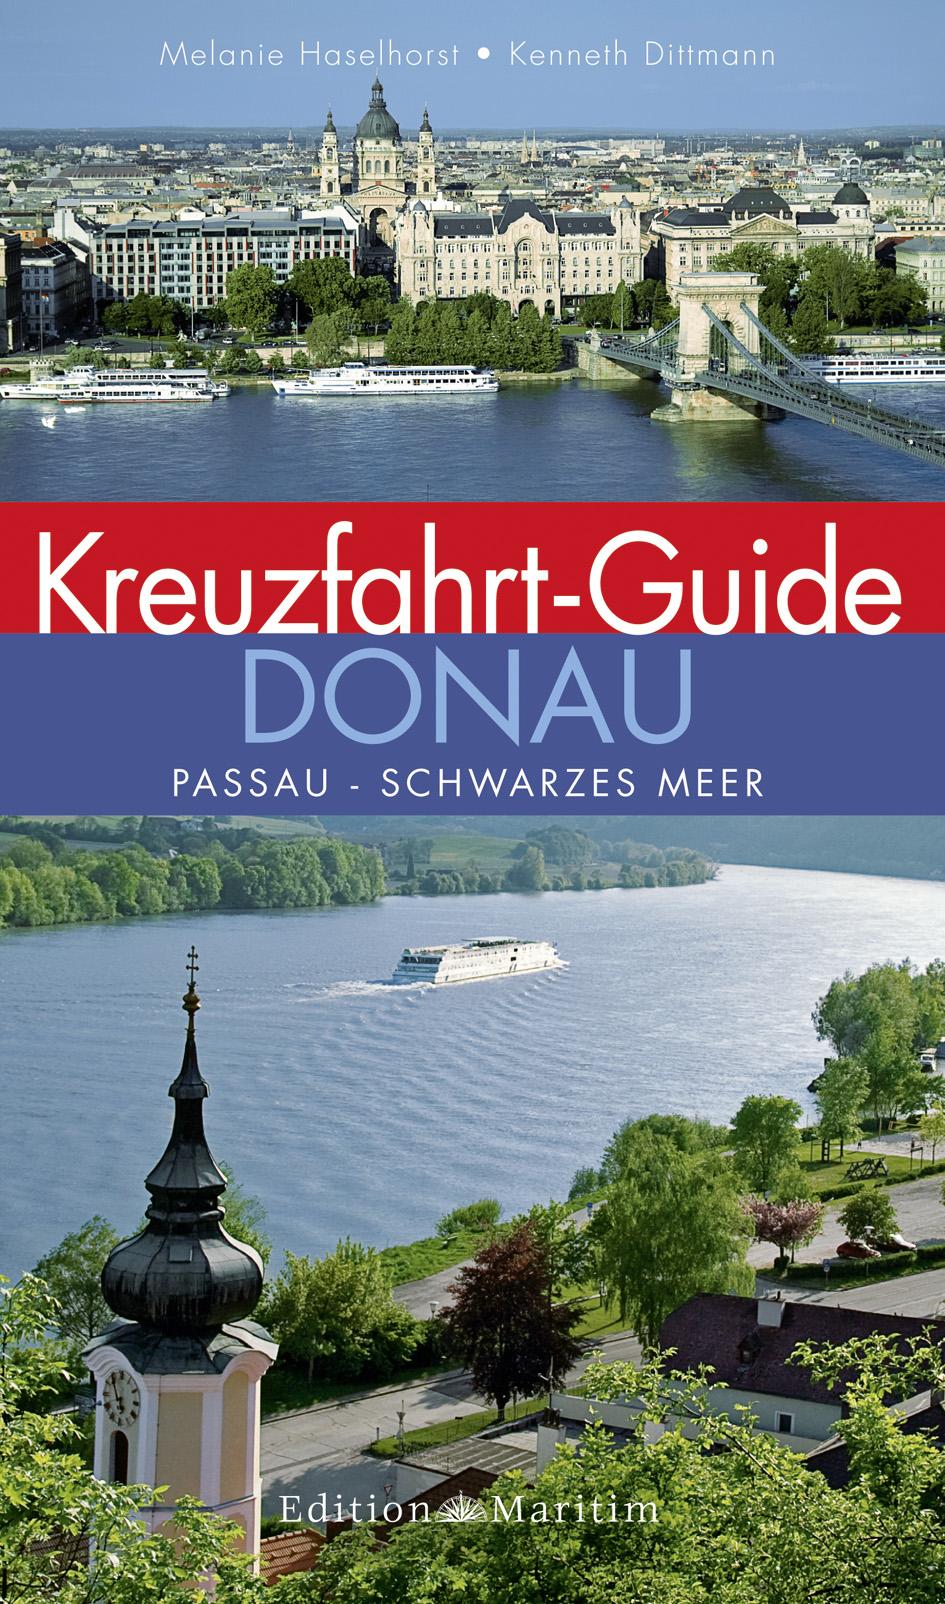 Kreuzfahrt-Guide Donau: Passau - Schwarzes Meer...